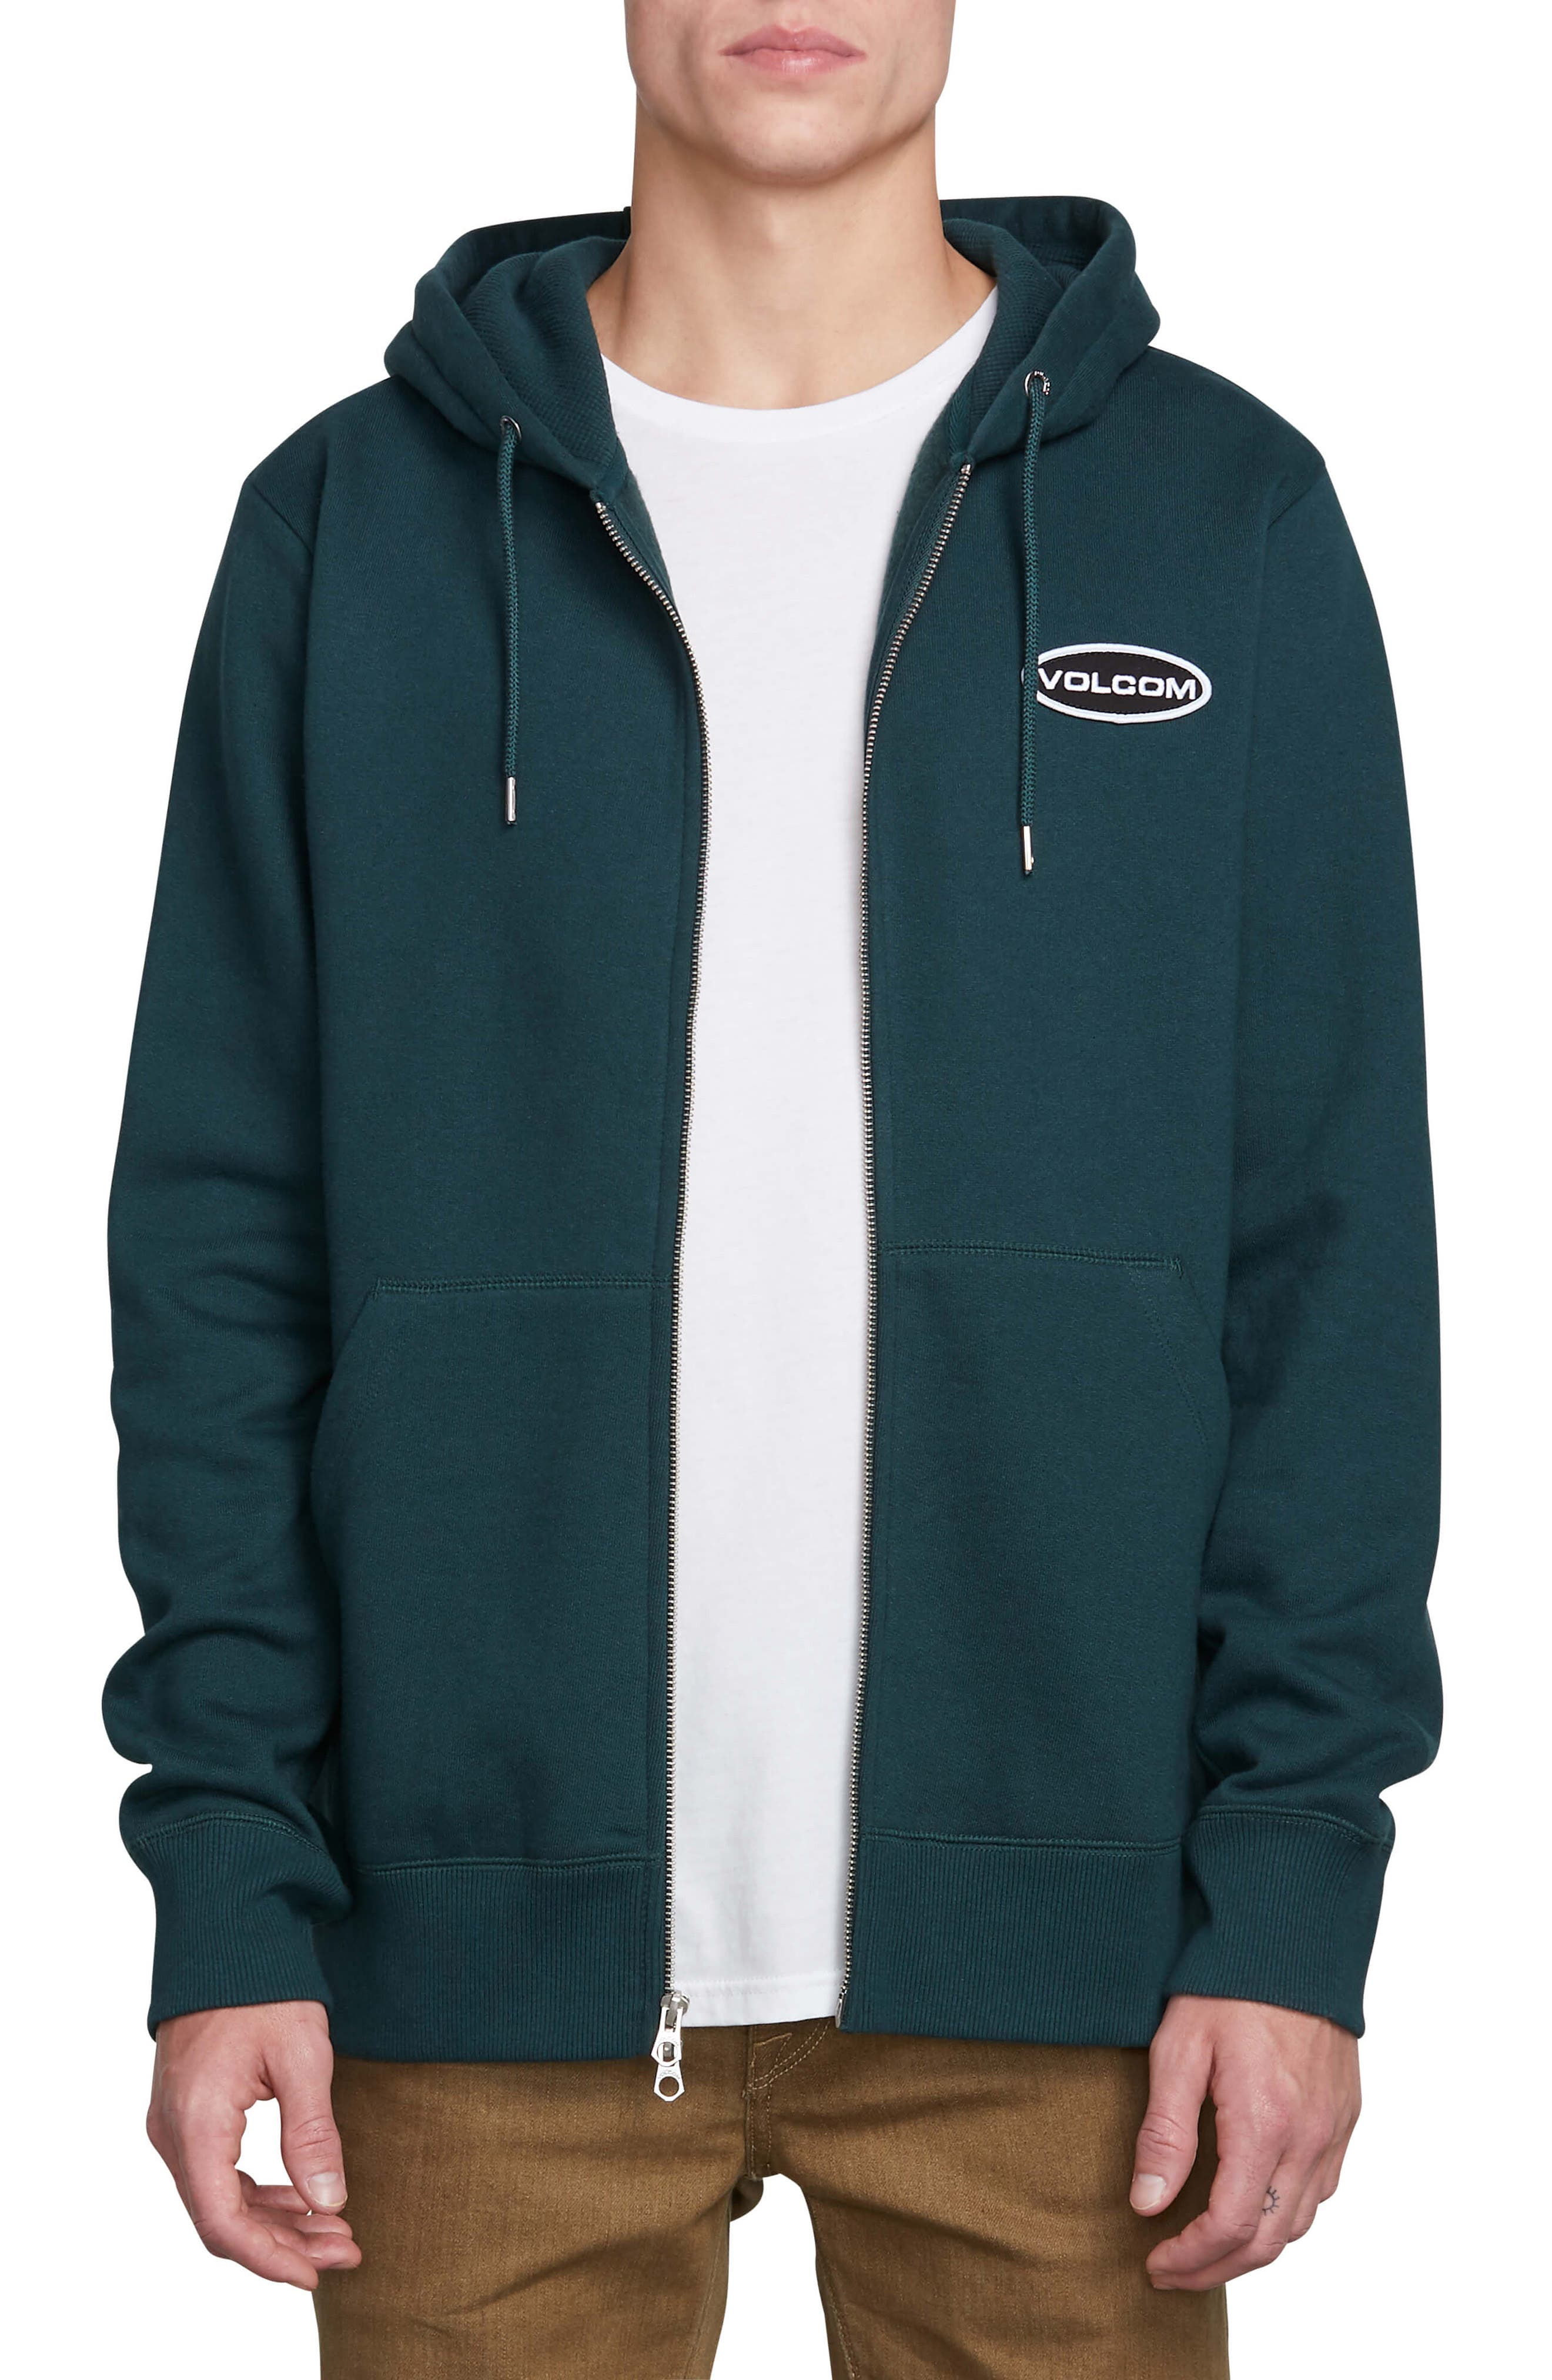 VOLCOM,                             Shop Zip Hoodie Jacket,                             Main thumbnail 1, color,                             DARK PINE